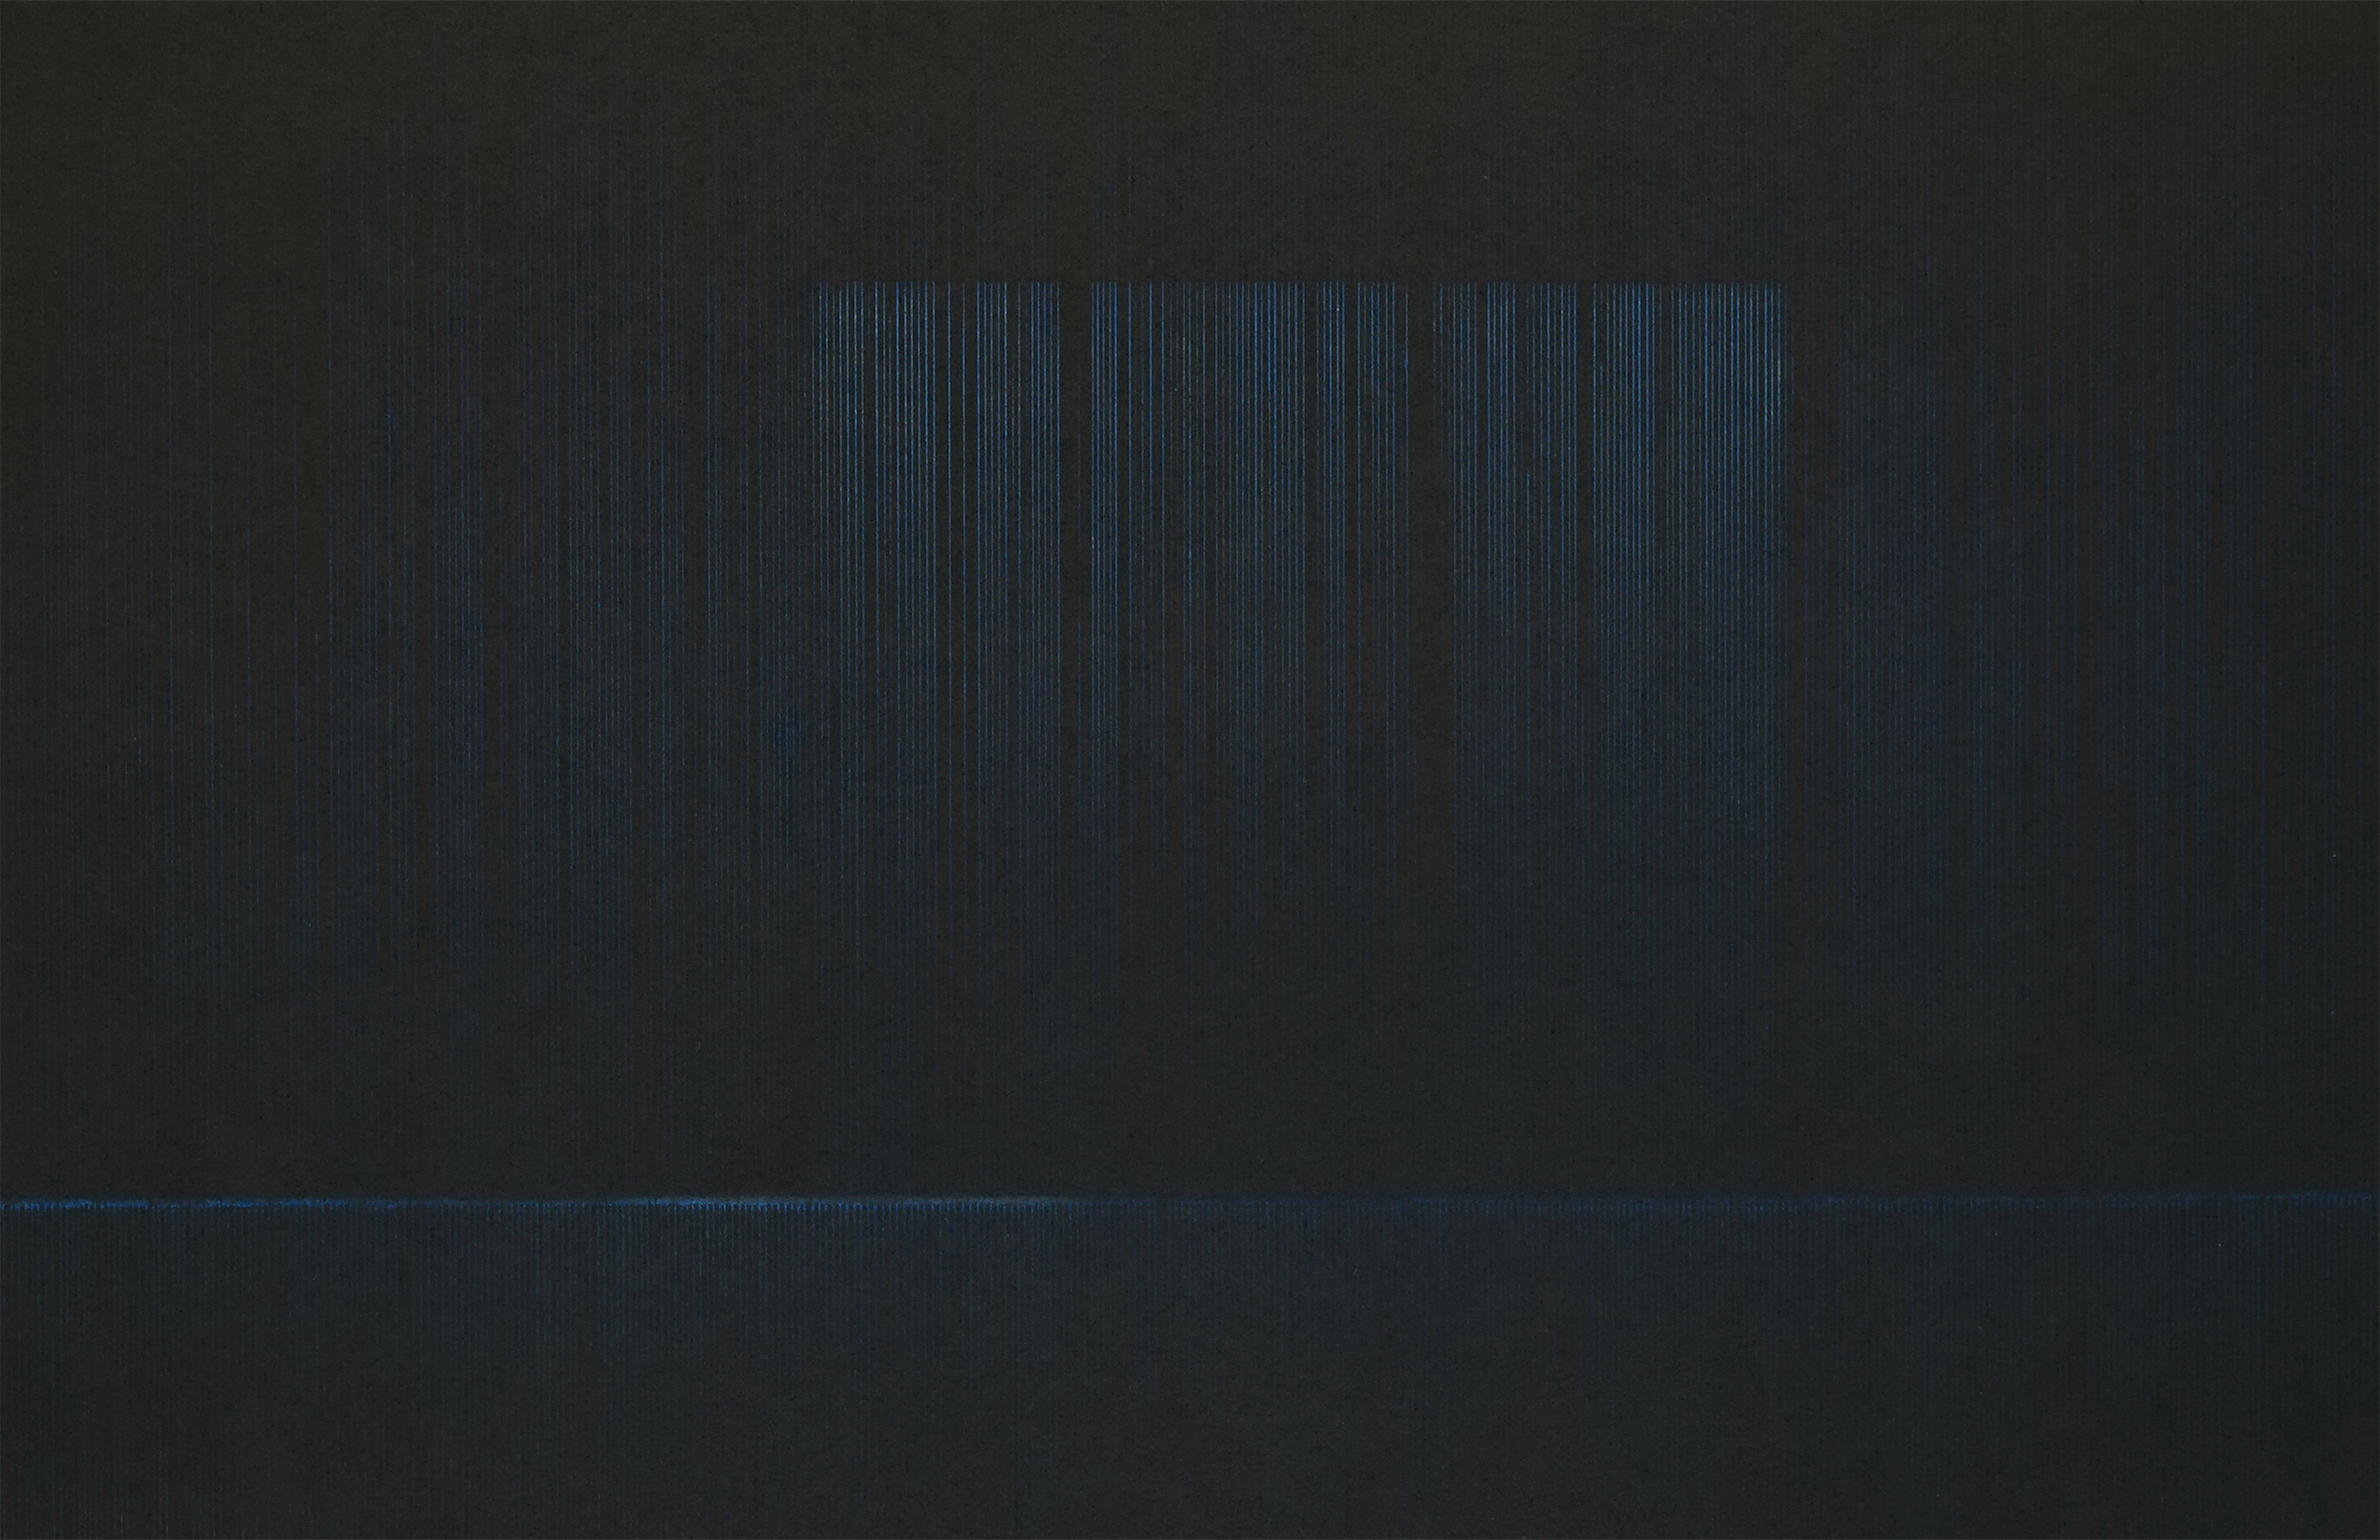 Obscure One, State III/III, 1/1